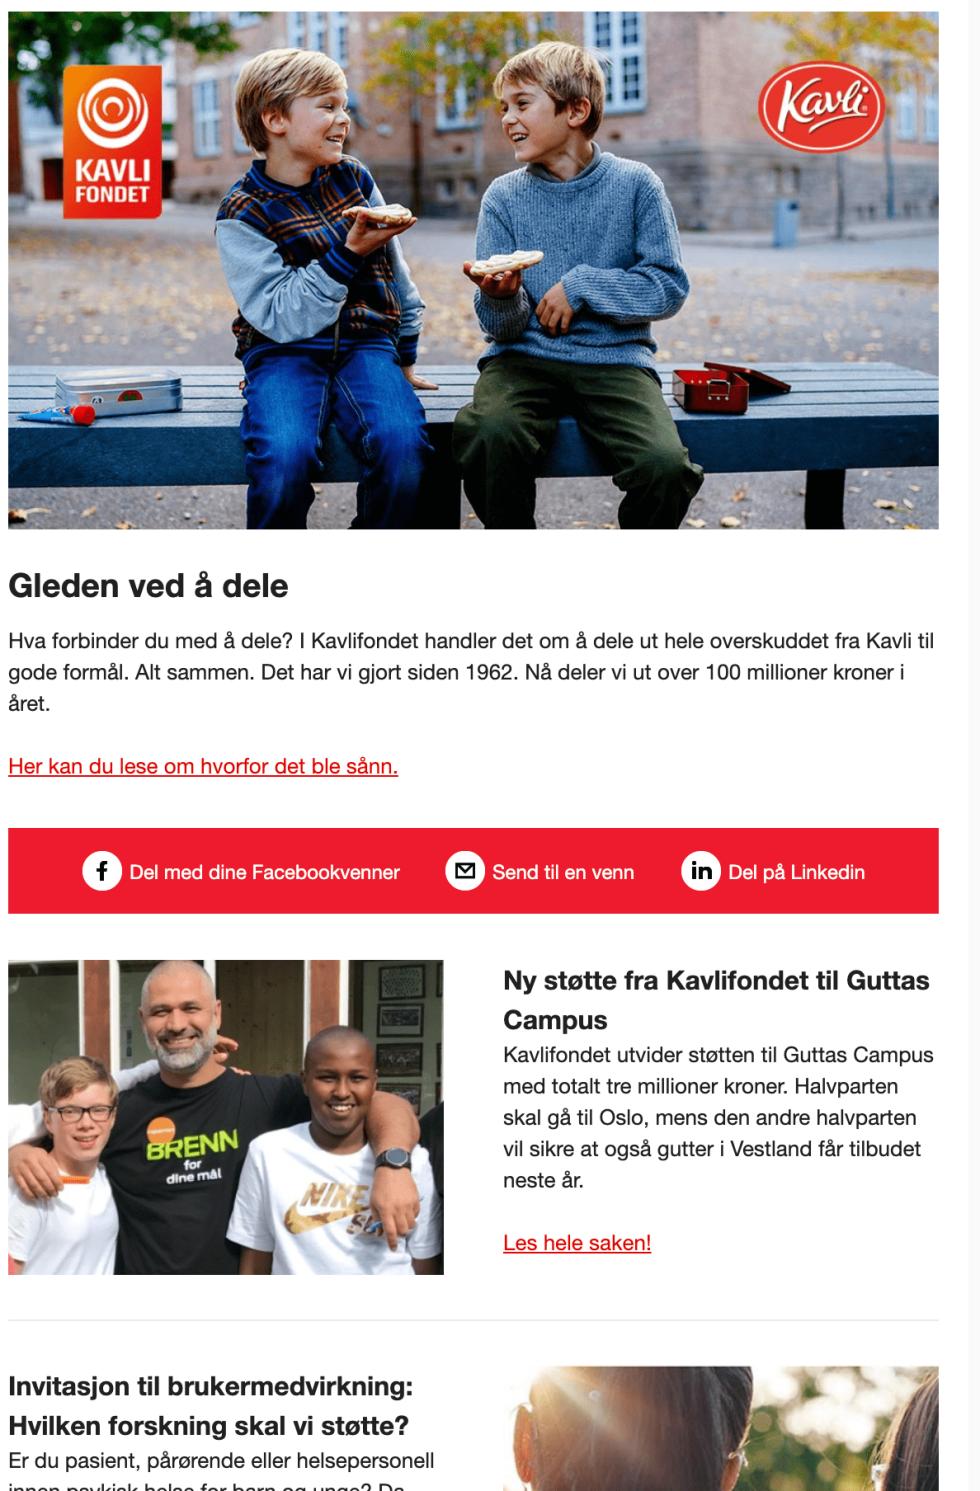 Image of a newsletter for Kavli Fondet